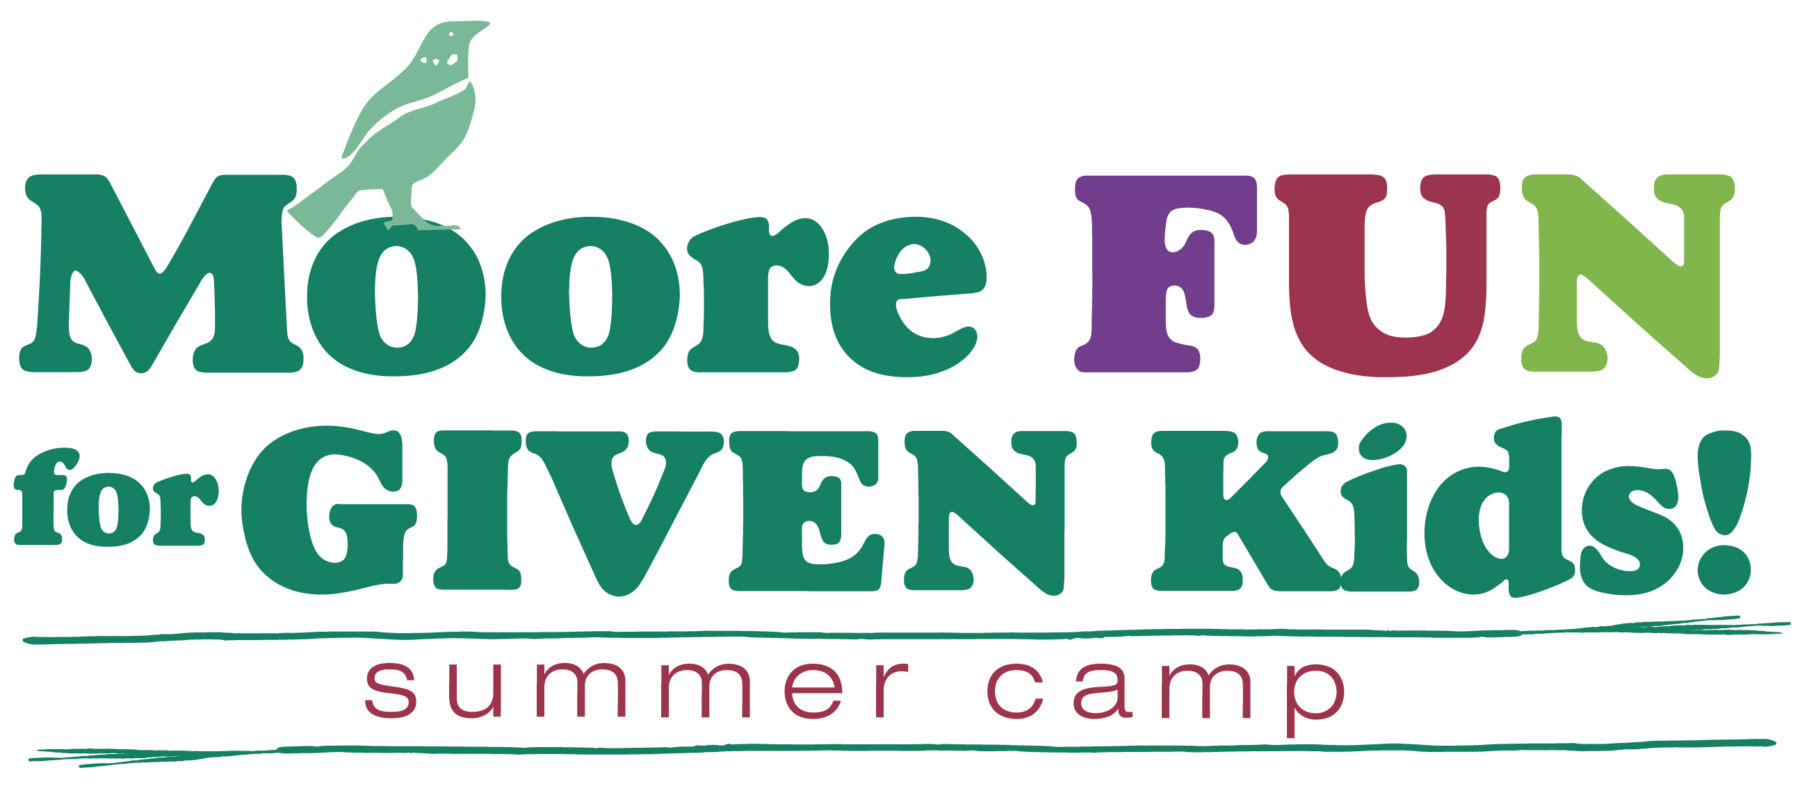 mooreFun_summer-camp-02.jpg